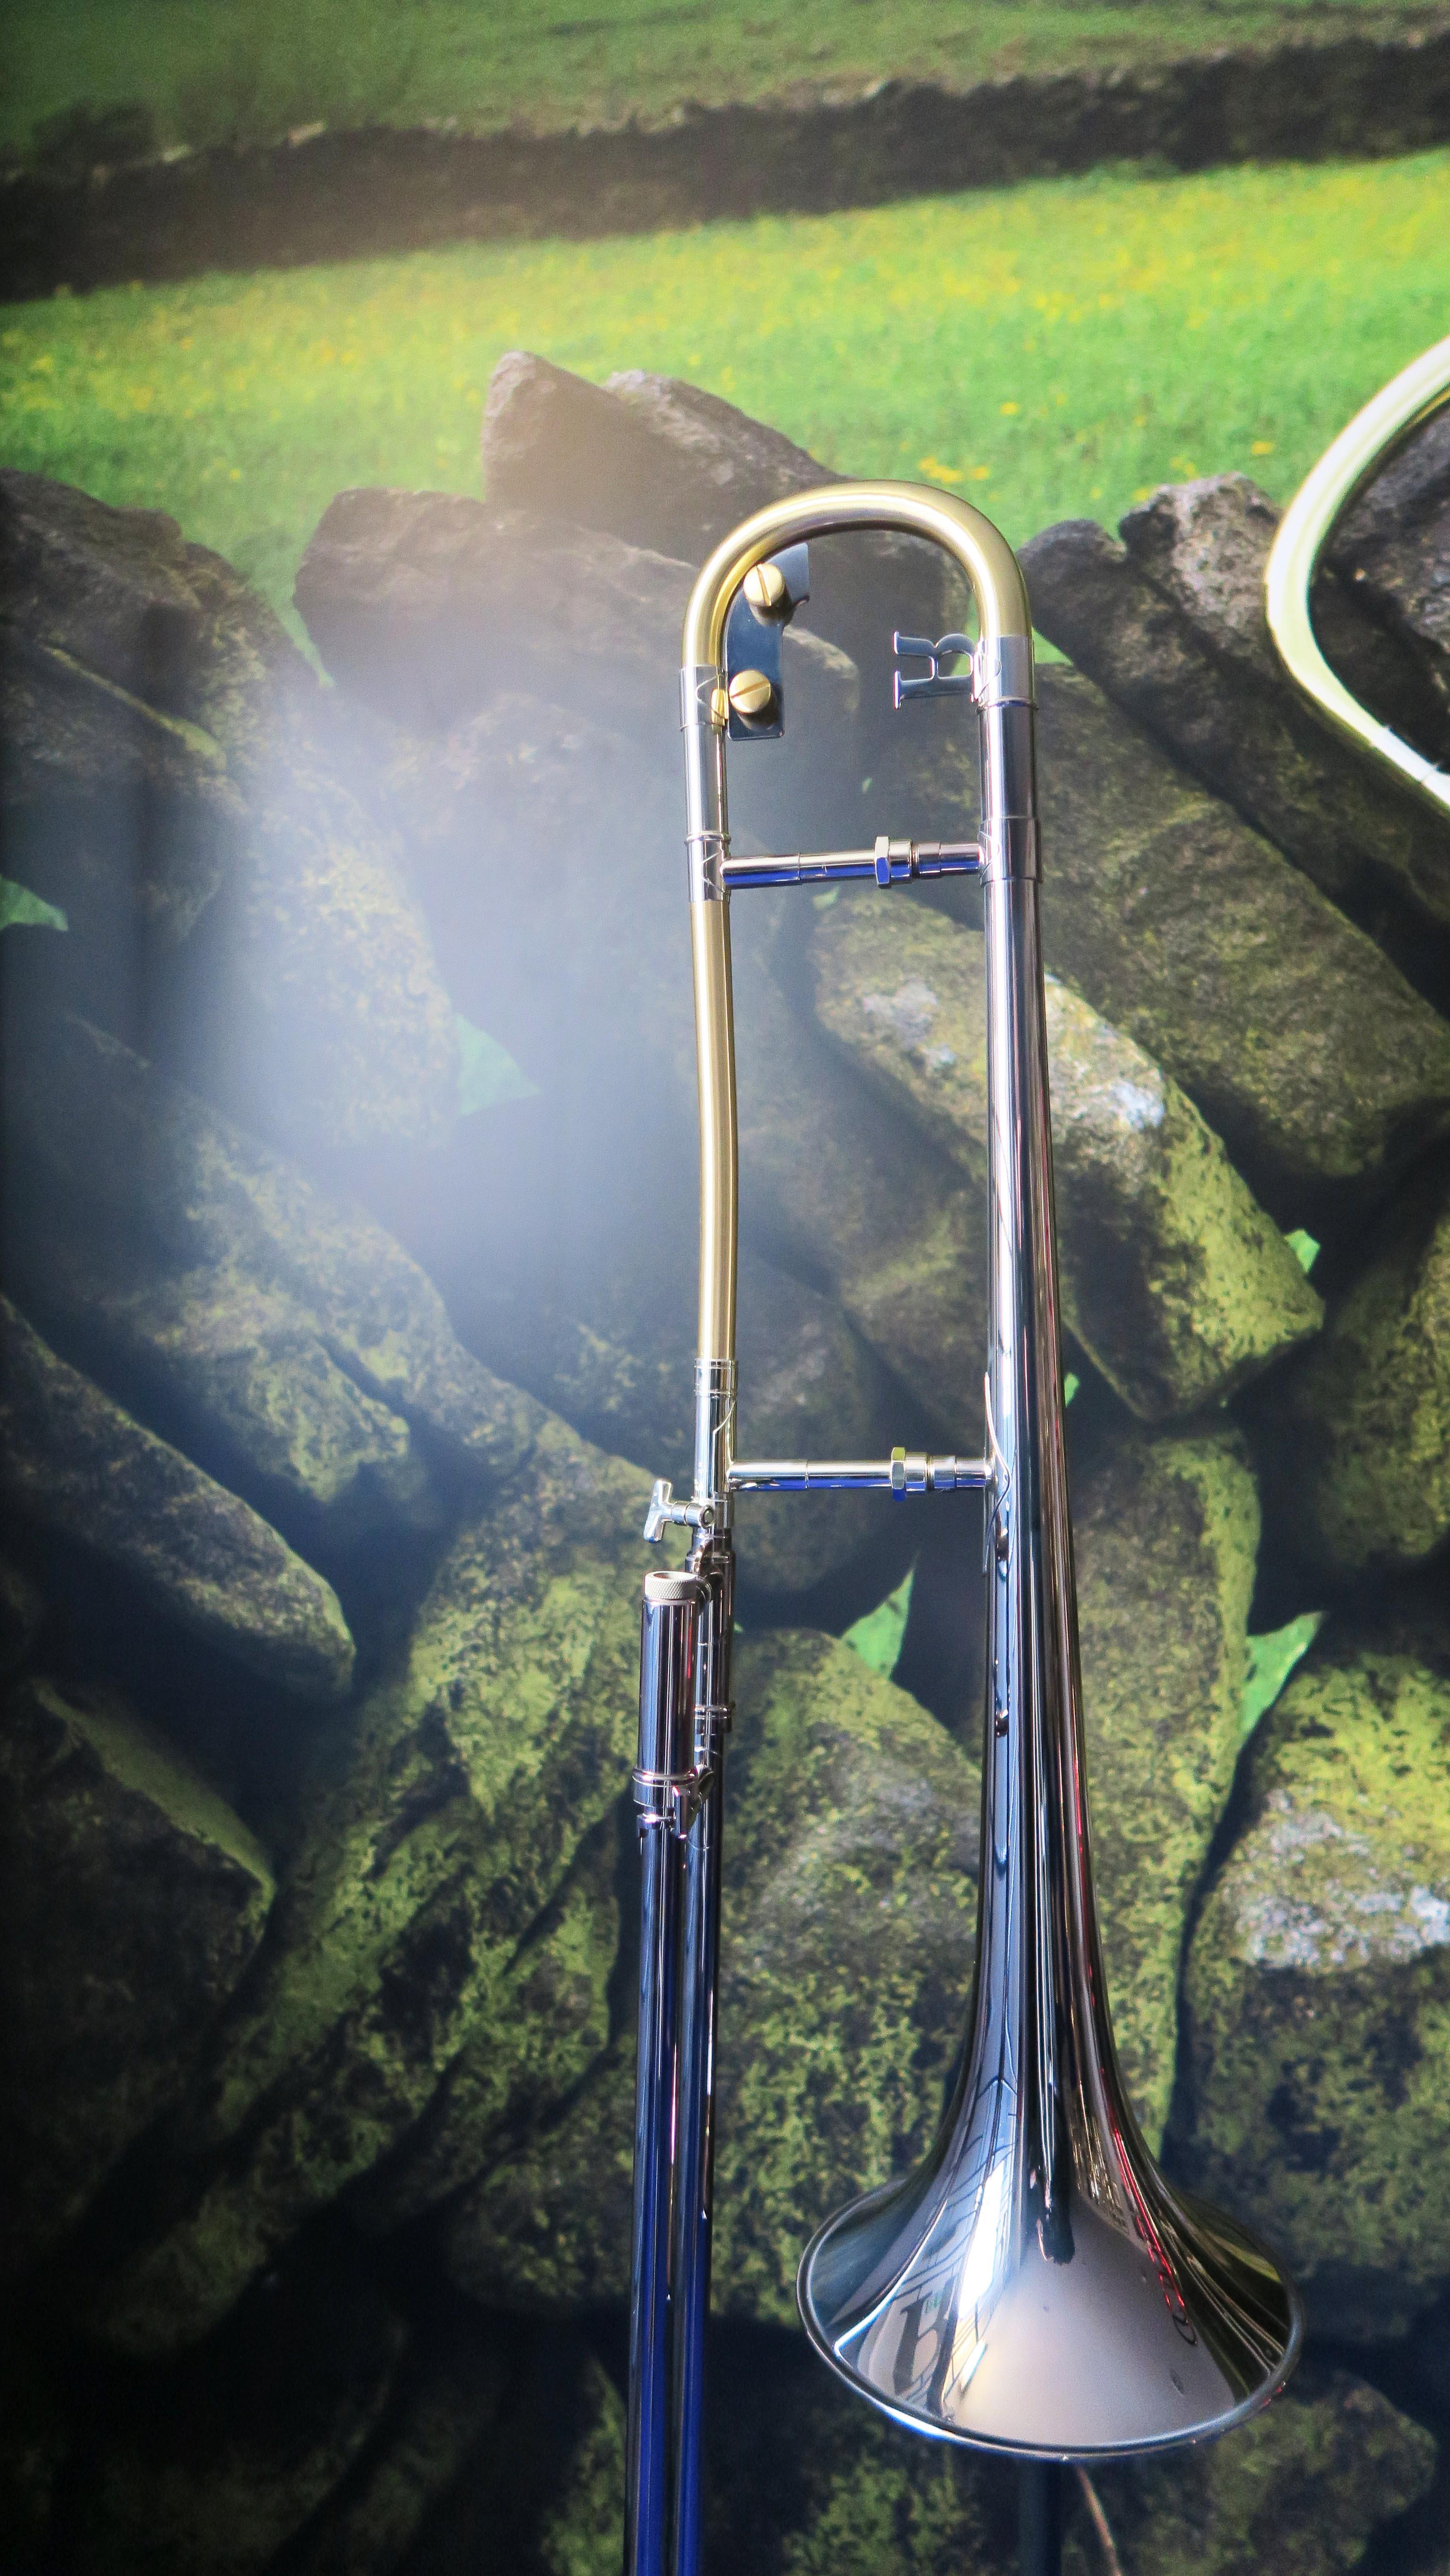 Finishes :: Michael Rath Trombones :: The world's leading